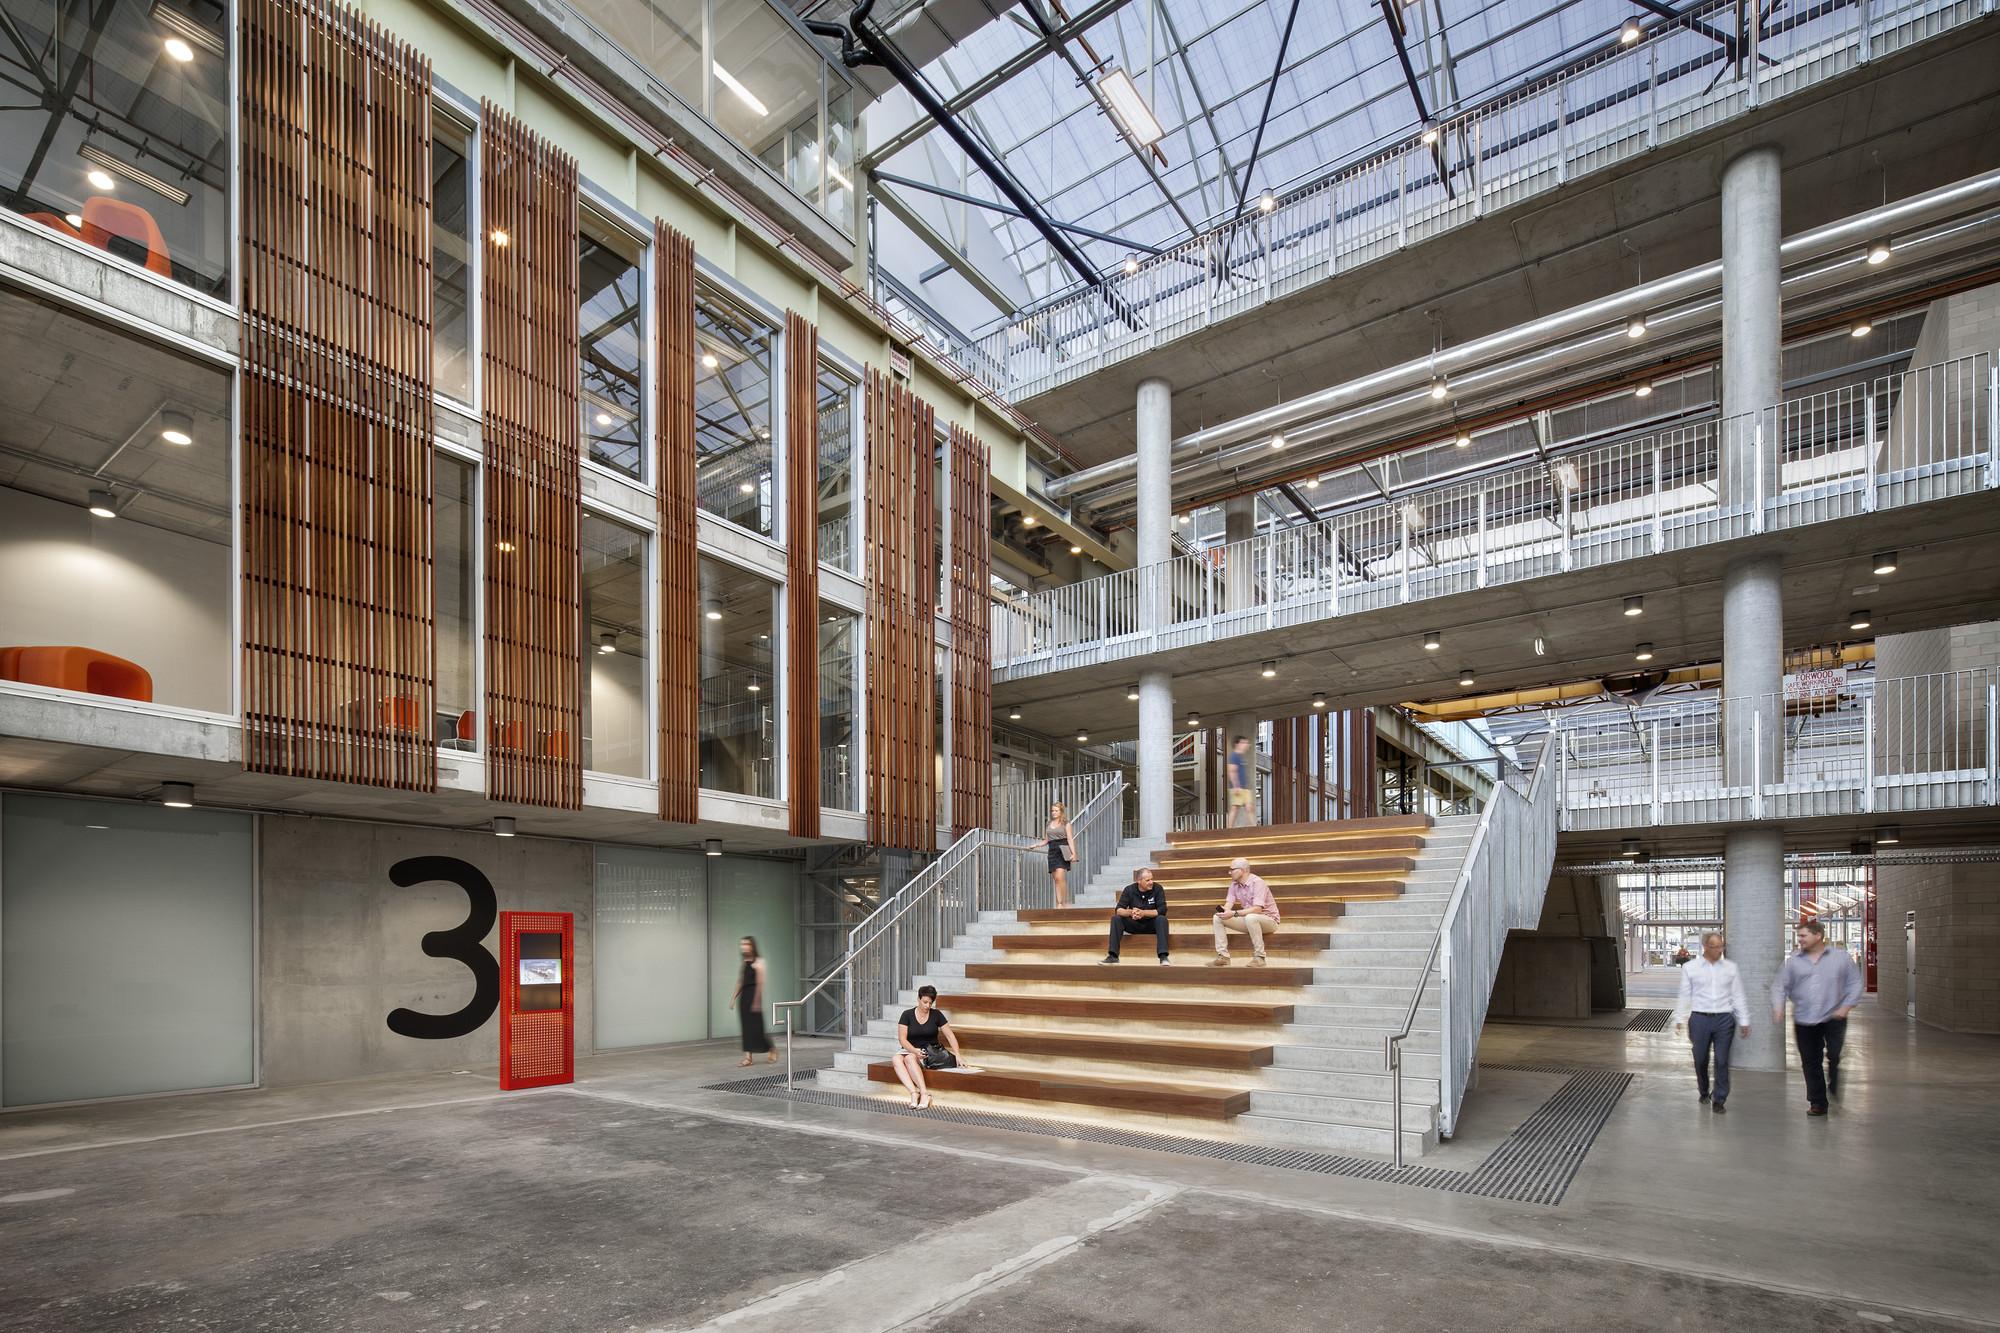 Mezzanine Cafe Industrial Loft